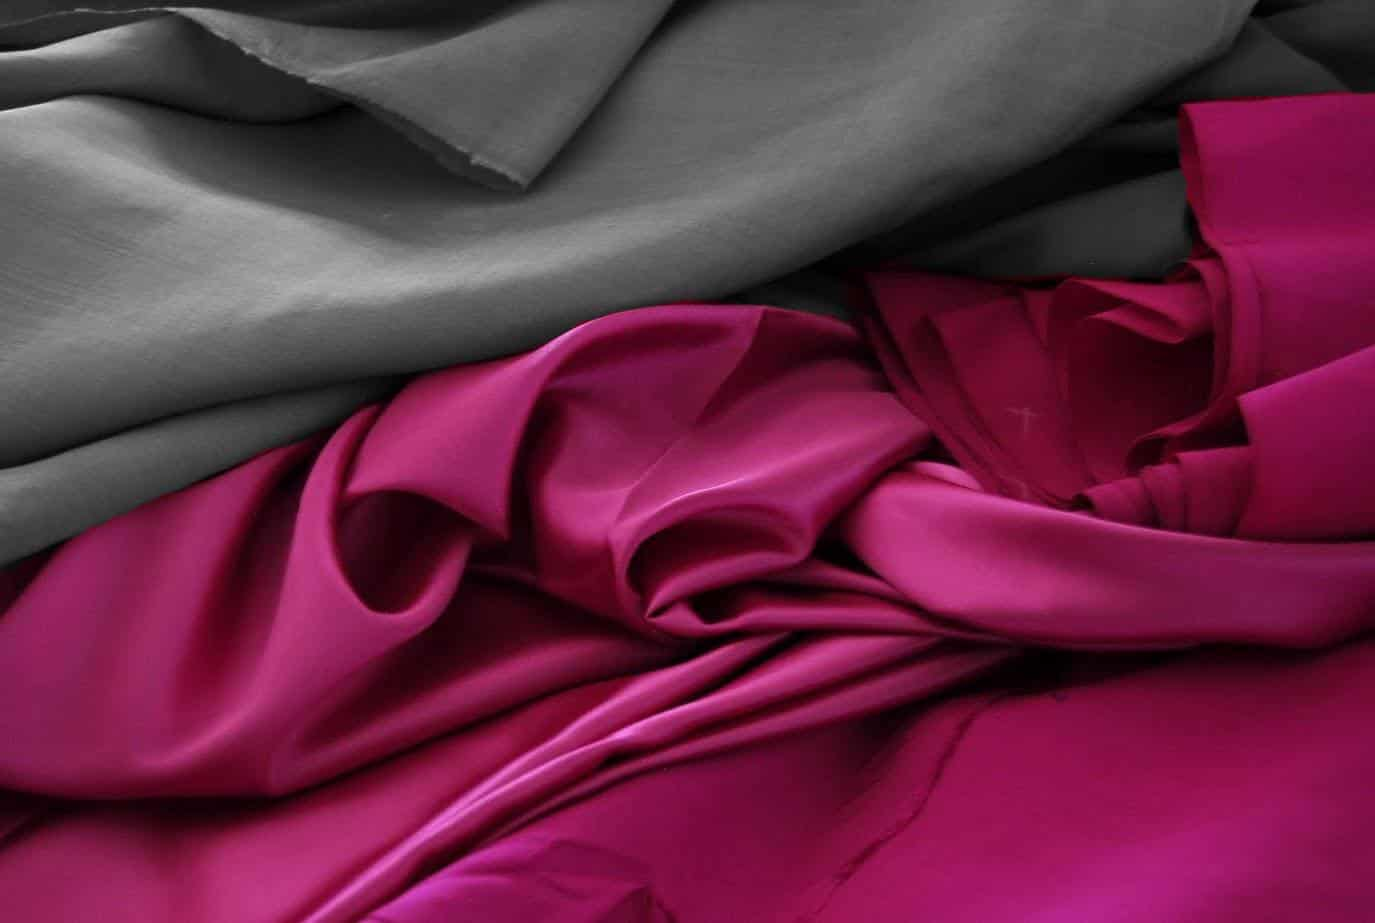 Silk fabric - B&W